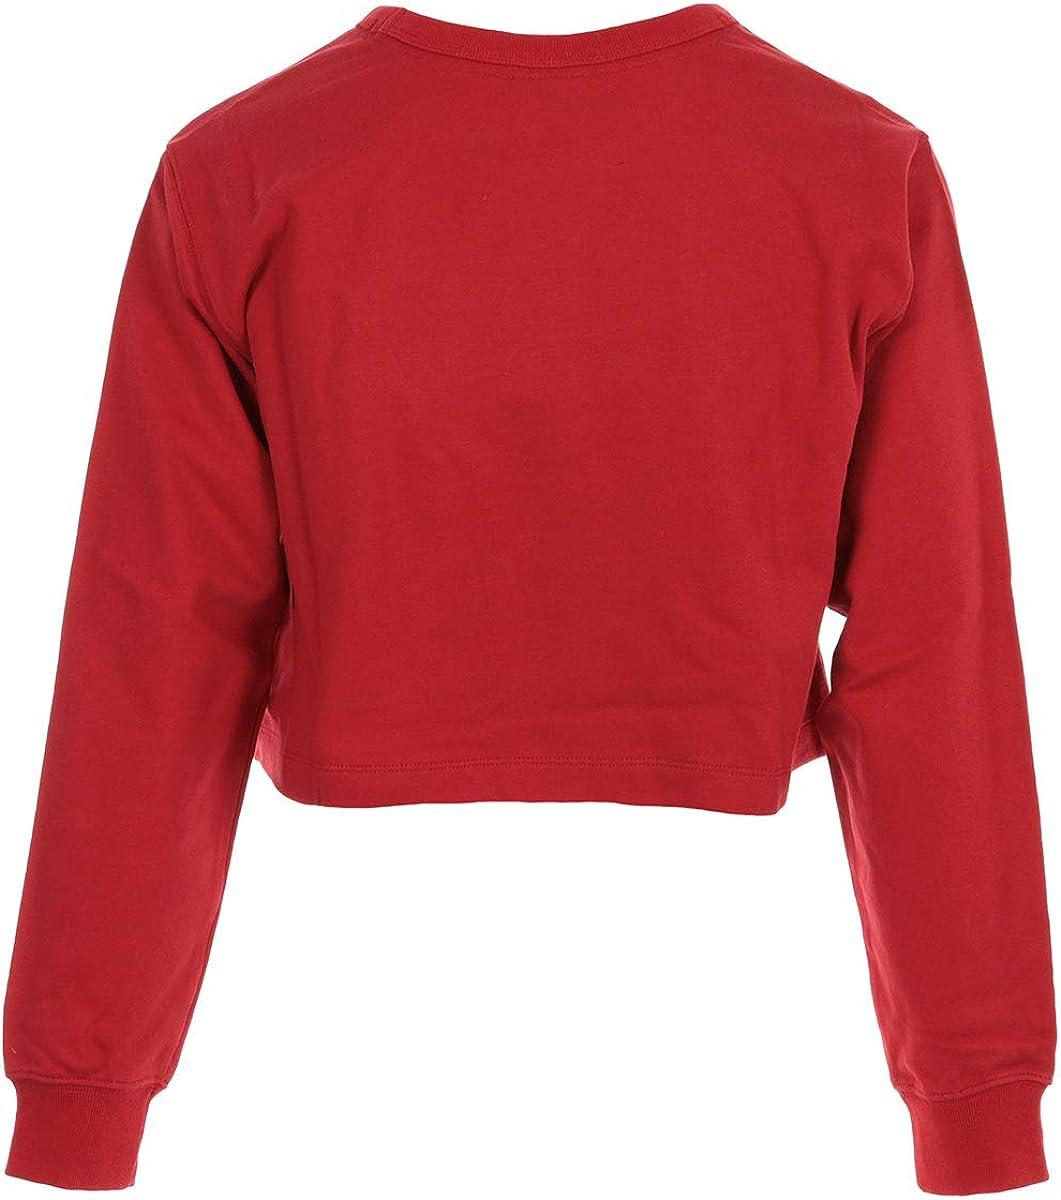 Champion Crewneck Croptop WN's, Sweatshirt Rot